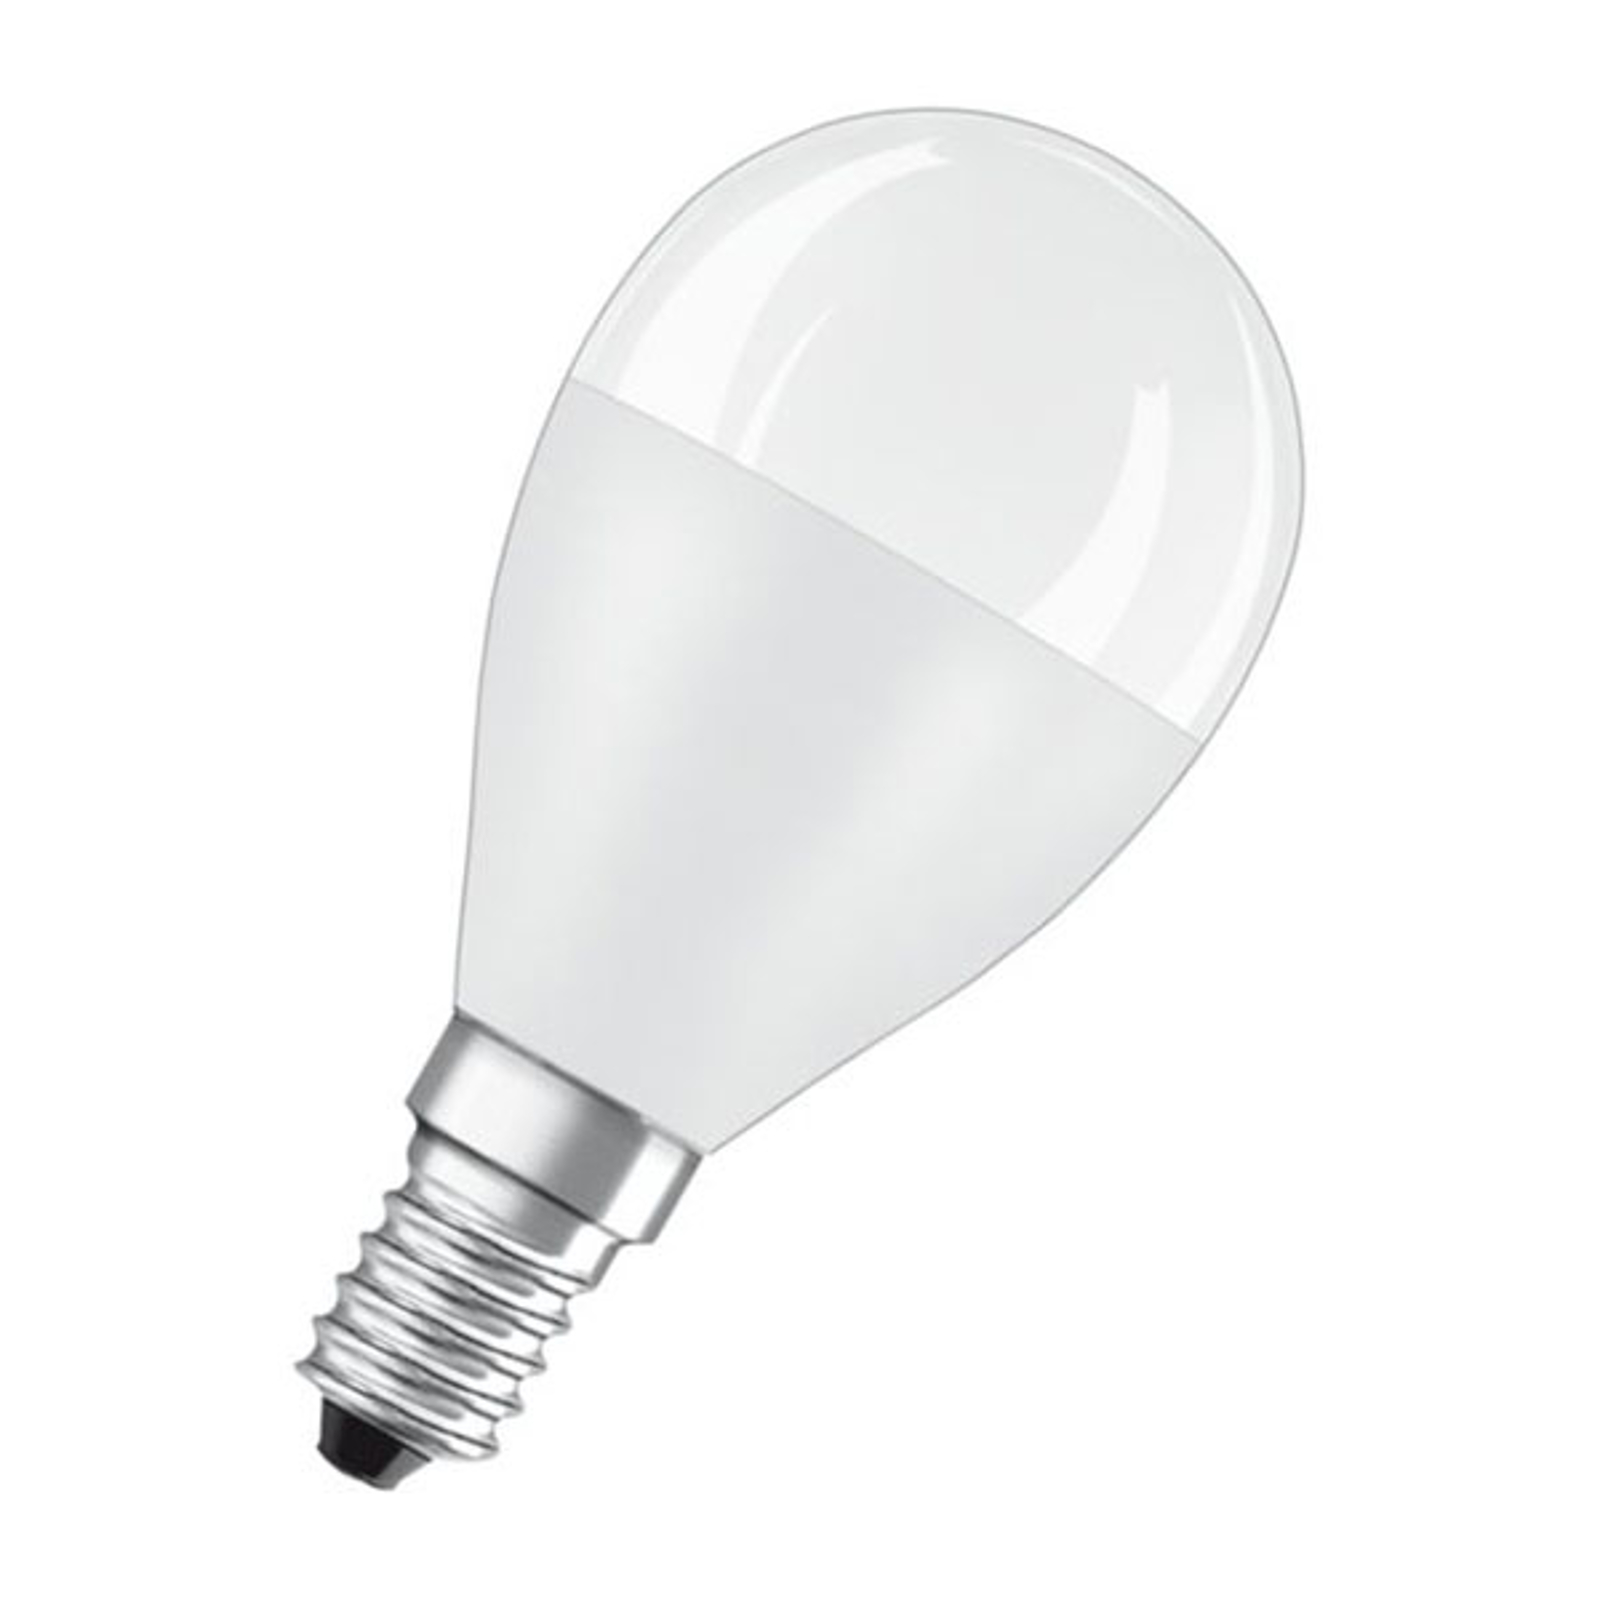 OSRAM Classic P LED-lampa E14 7,5 W 2700K matt